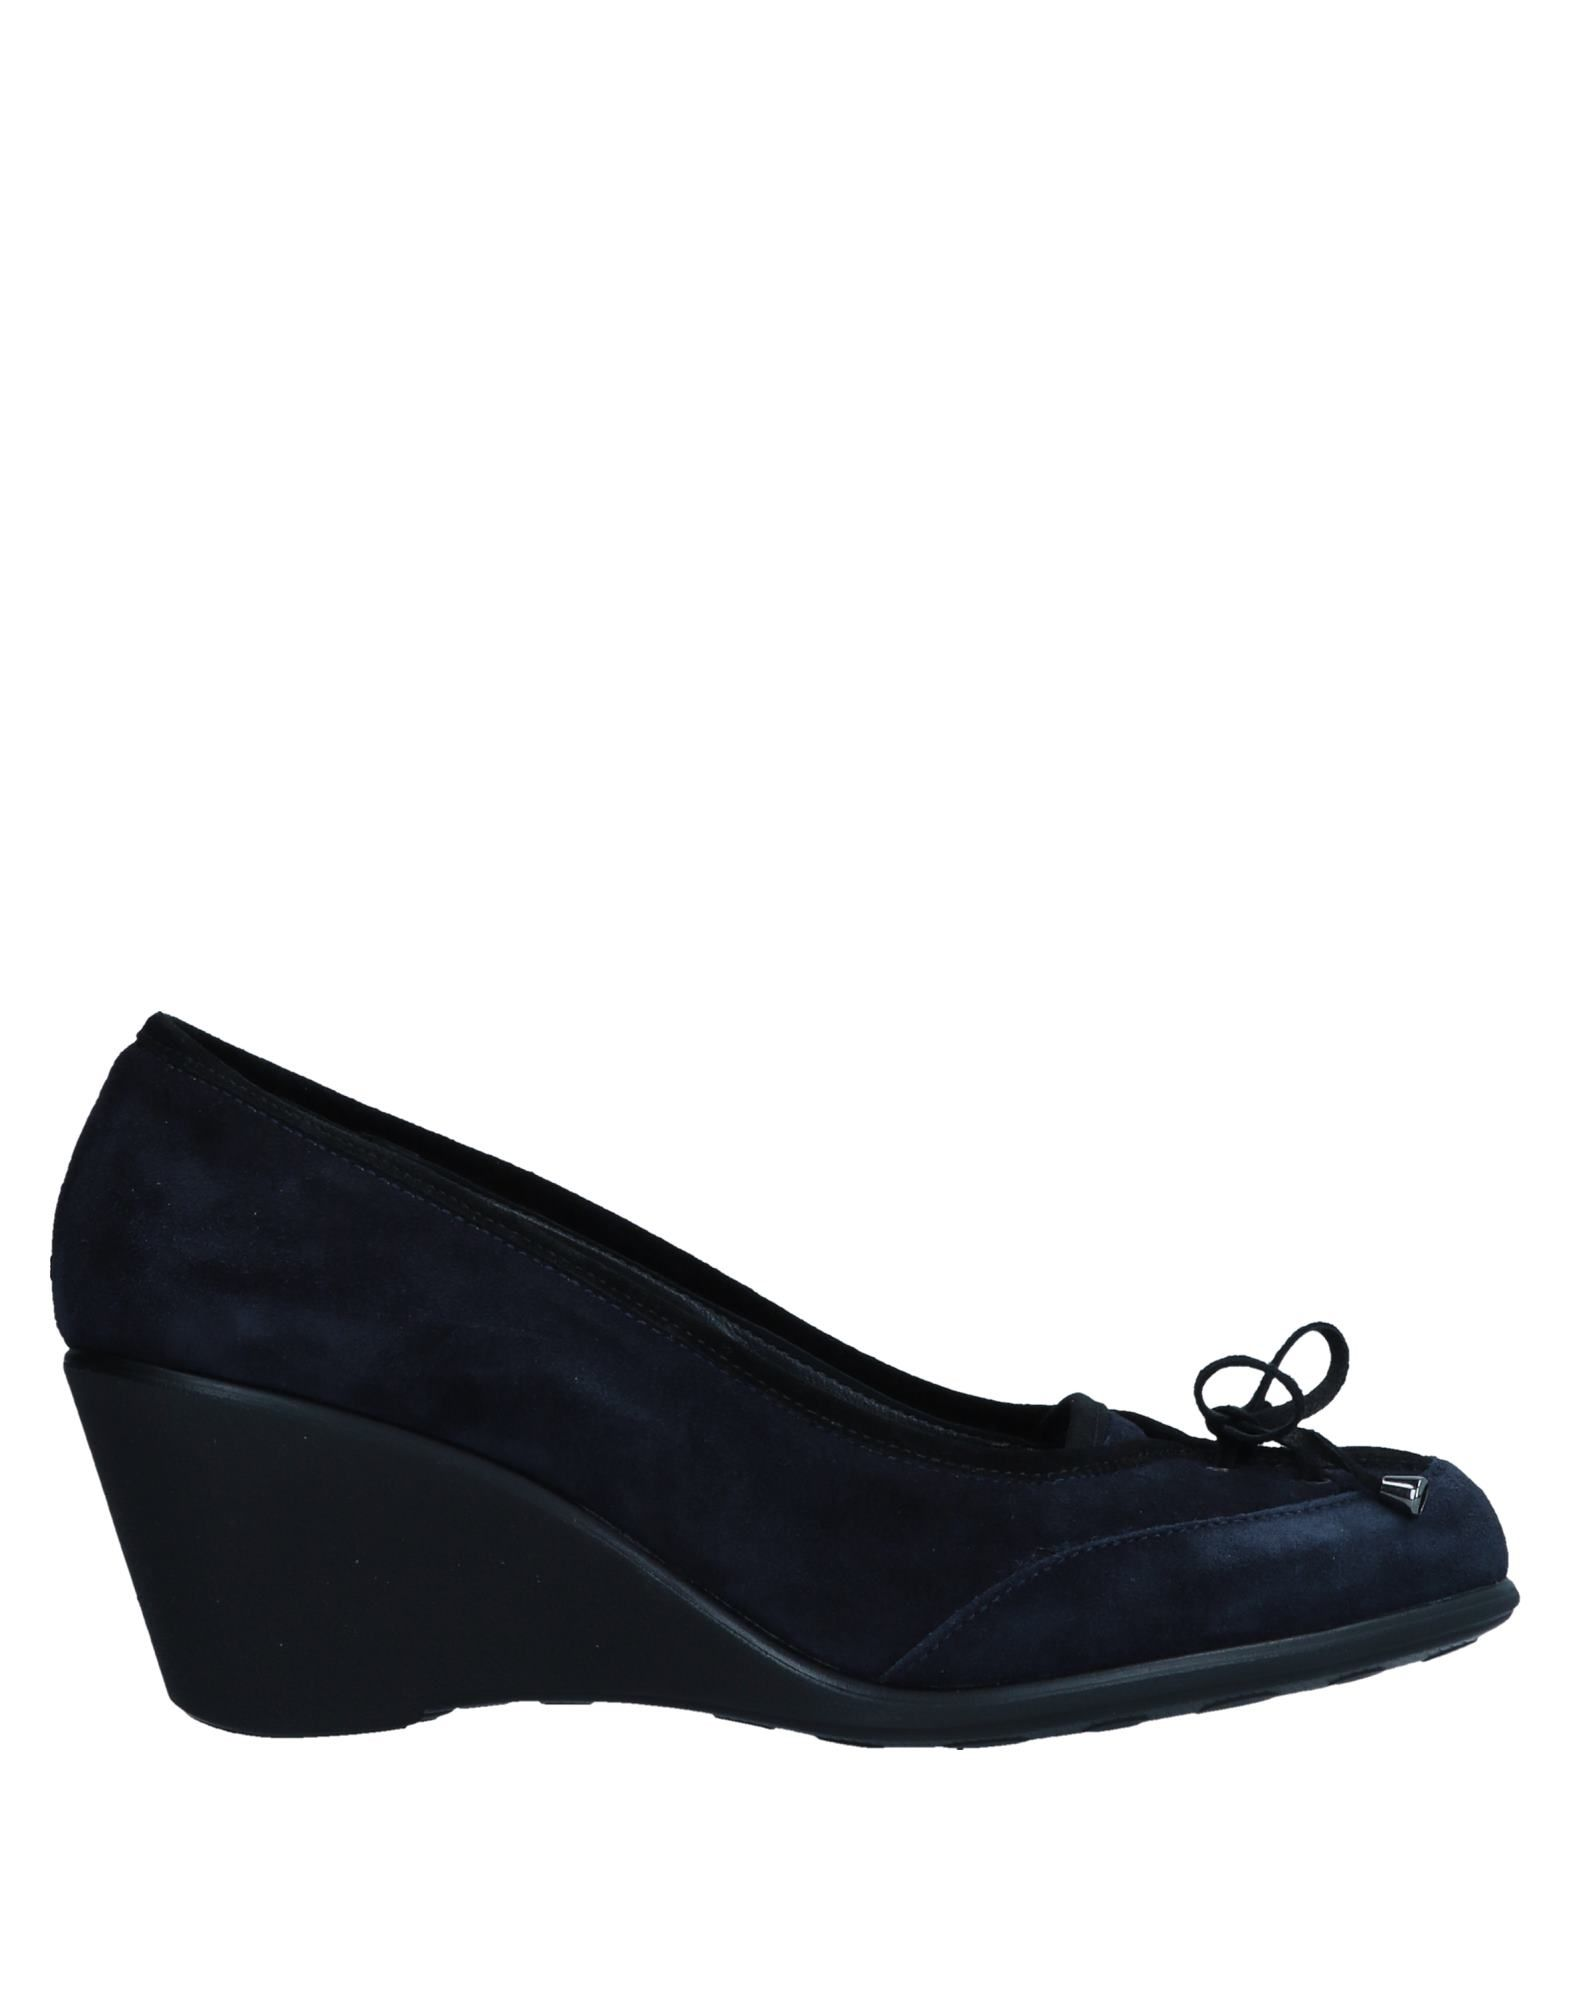 Valleverde Pumps Damen  11547494AW Gute Qualität beliebte Schuhe